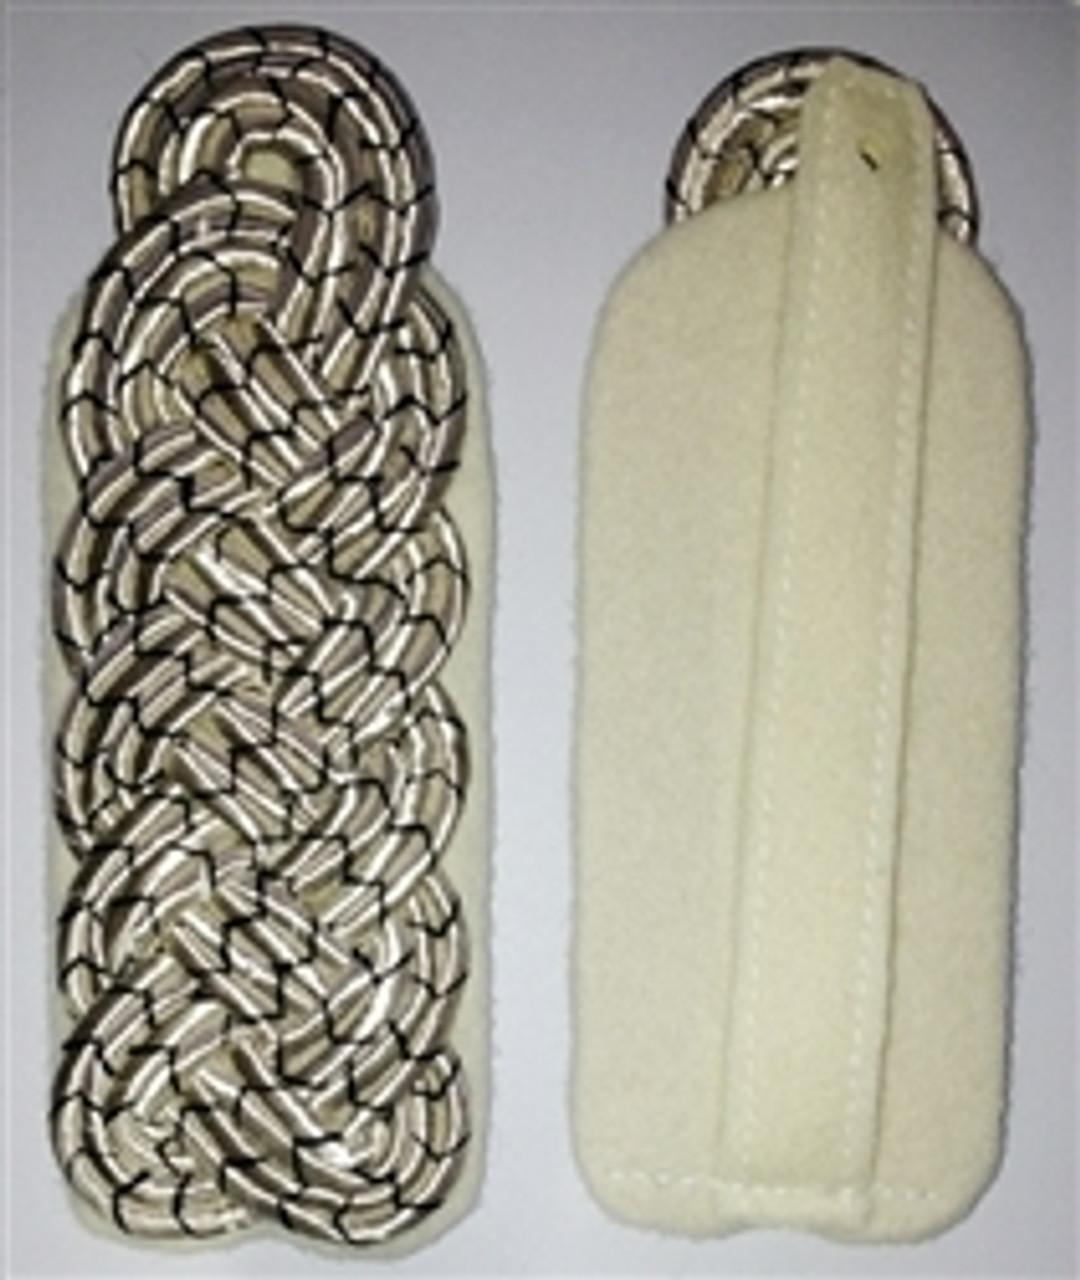 Slip-on Pattern Prussian Major Shoulder Boards - German Made from Hessen Antique